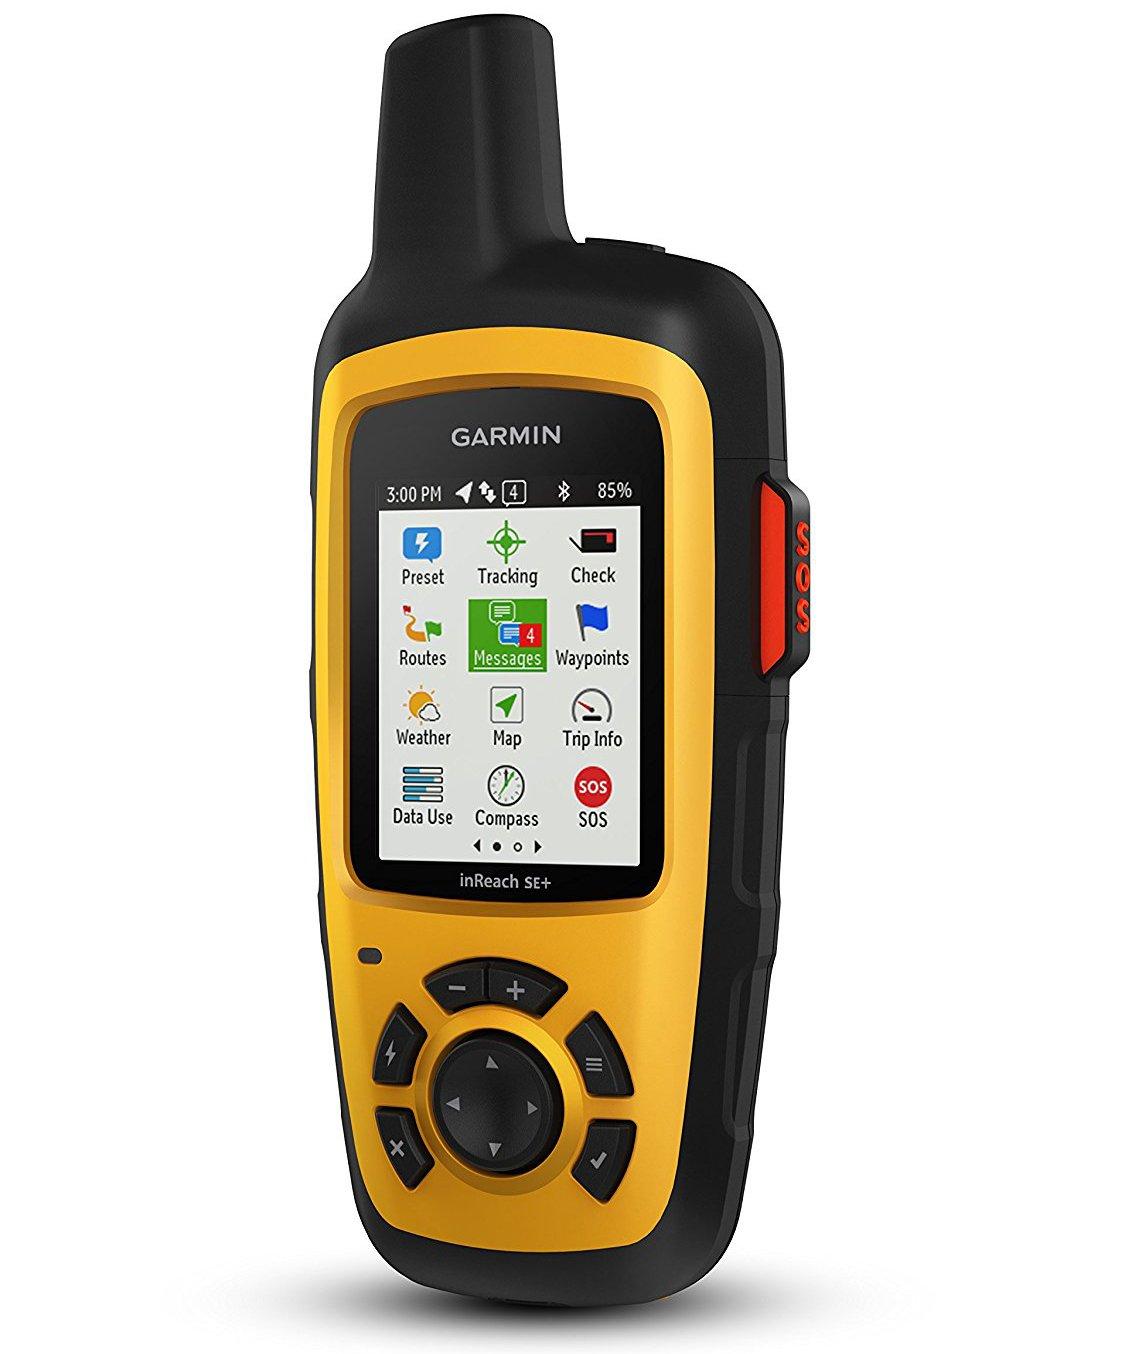 Garmin InReach SE+ GPS Bundle w/ Car Charger, Micro USB, Gadget Bag and more by Garmin (Image #5)